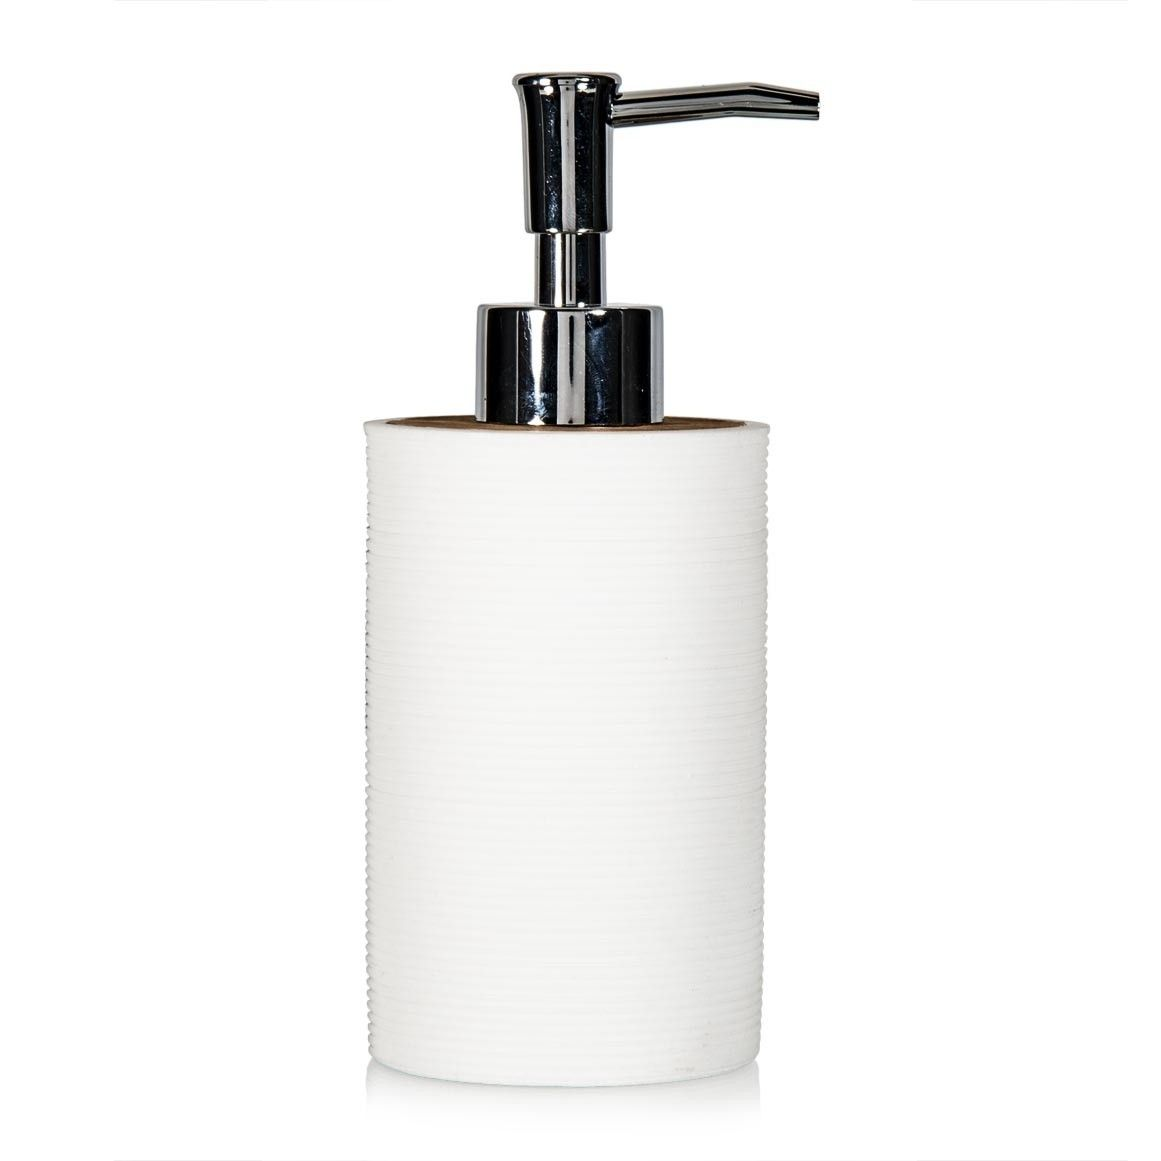 Textured Soap Dispenser